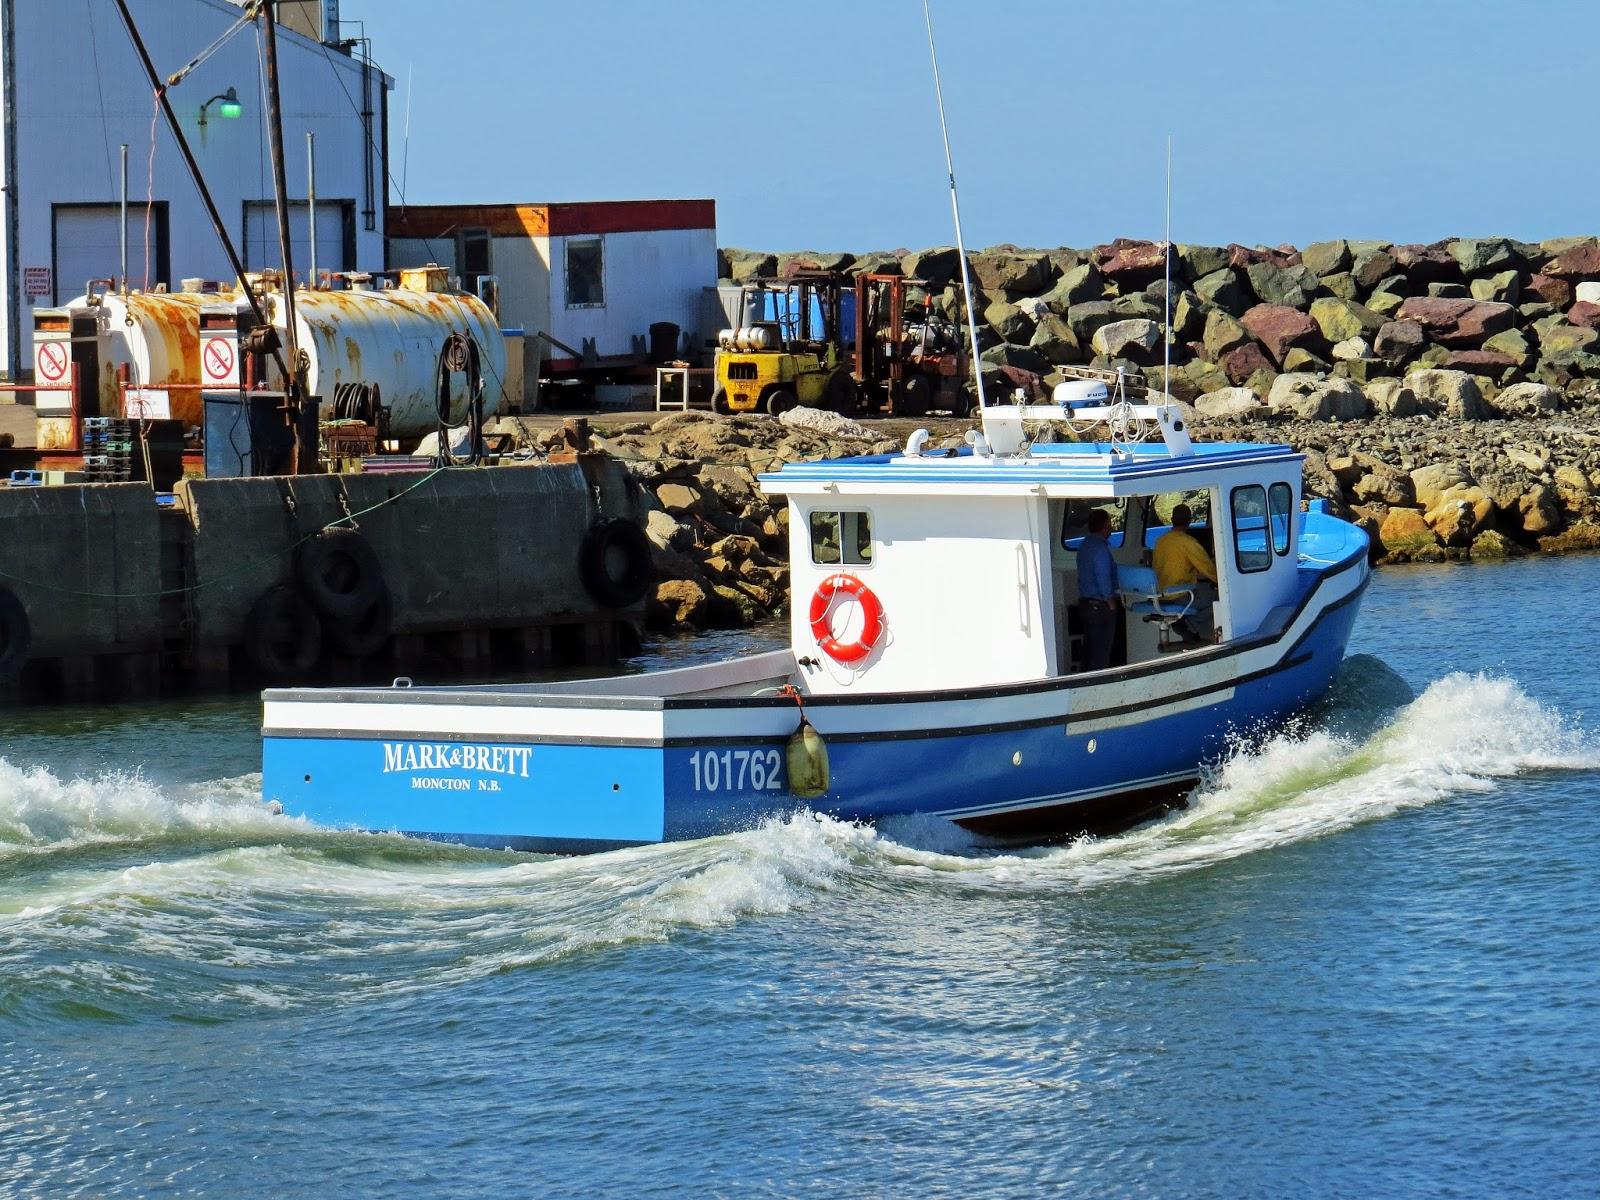 A cape breton nova scotia photo gallery november 2013 for Nova scotia fishing